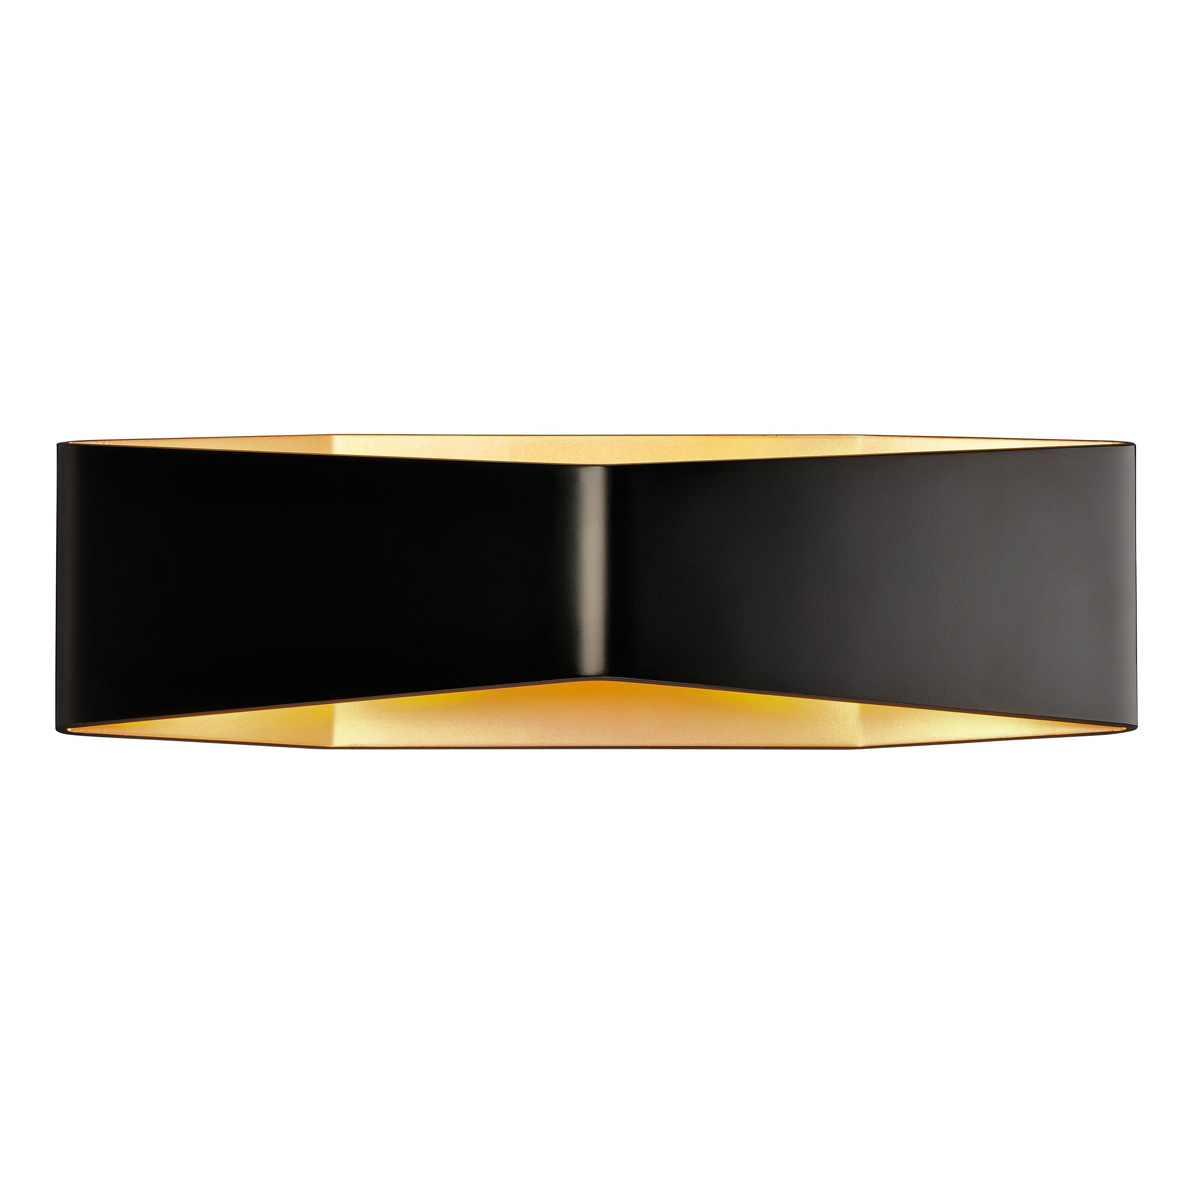 BIG CARISO LED Wandleuchte 2, schwarz/ messing 2x 9W LED, 3000K